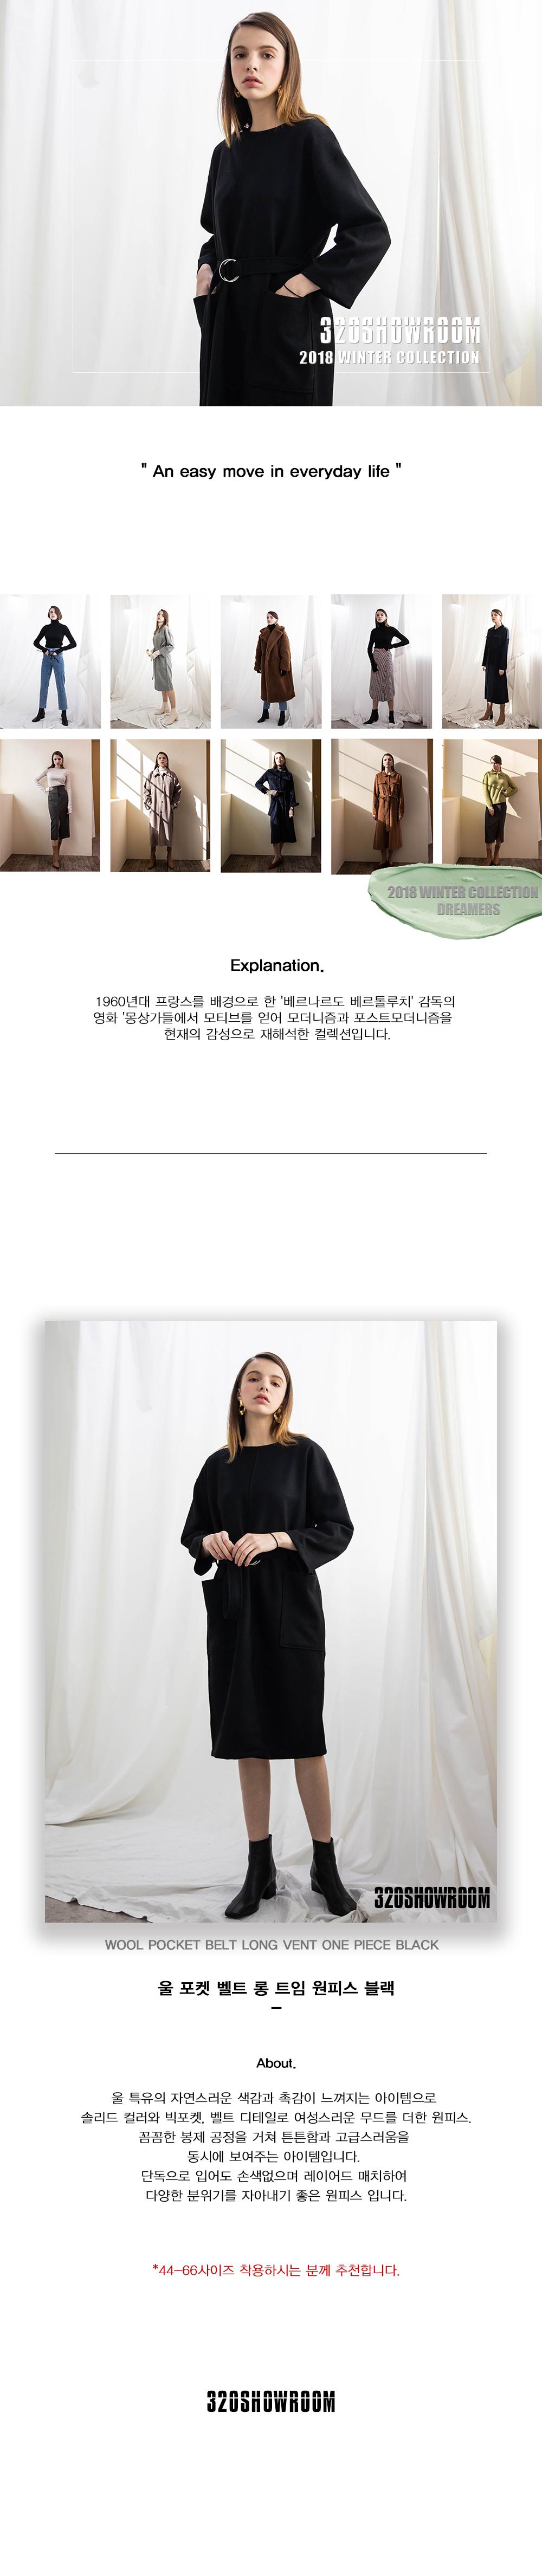 pocket-dress-black_01.jpg